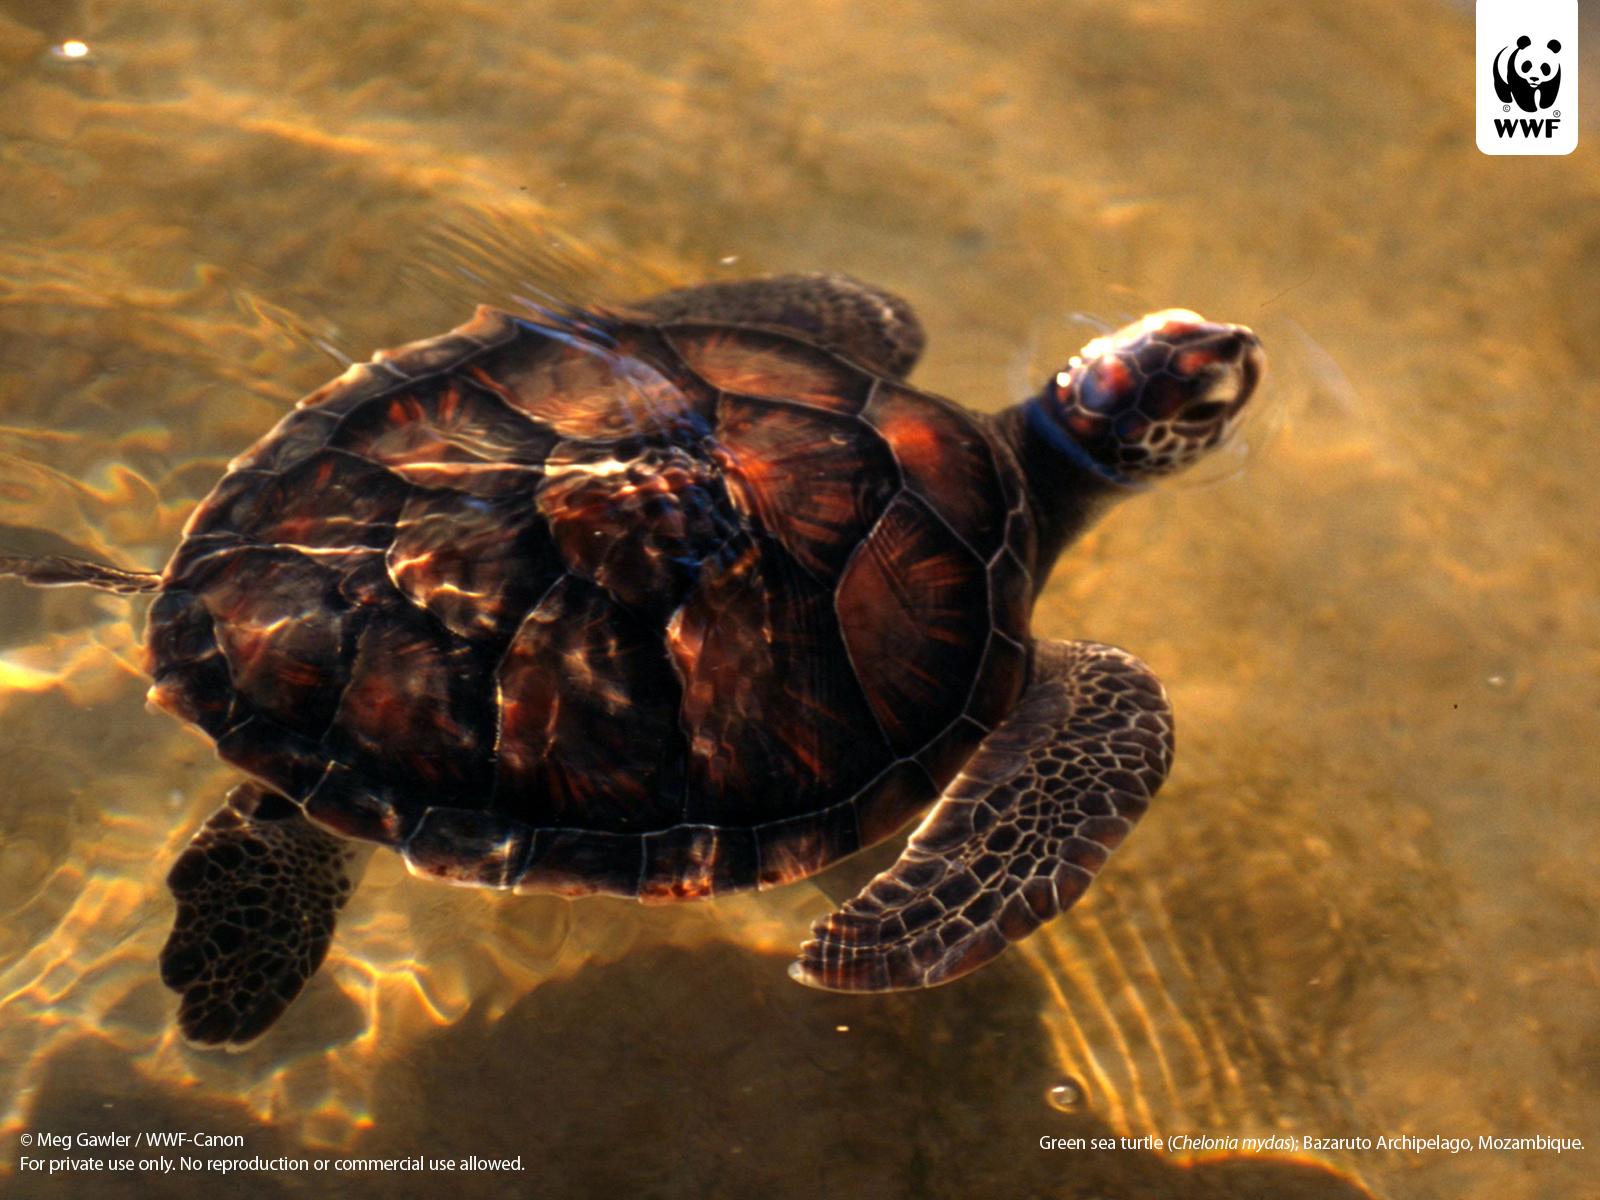 44 Sea Turtle Iphone Wallpaper On Wallpapersafari